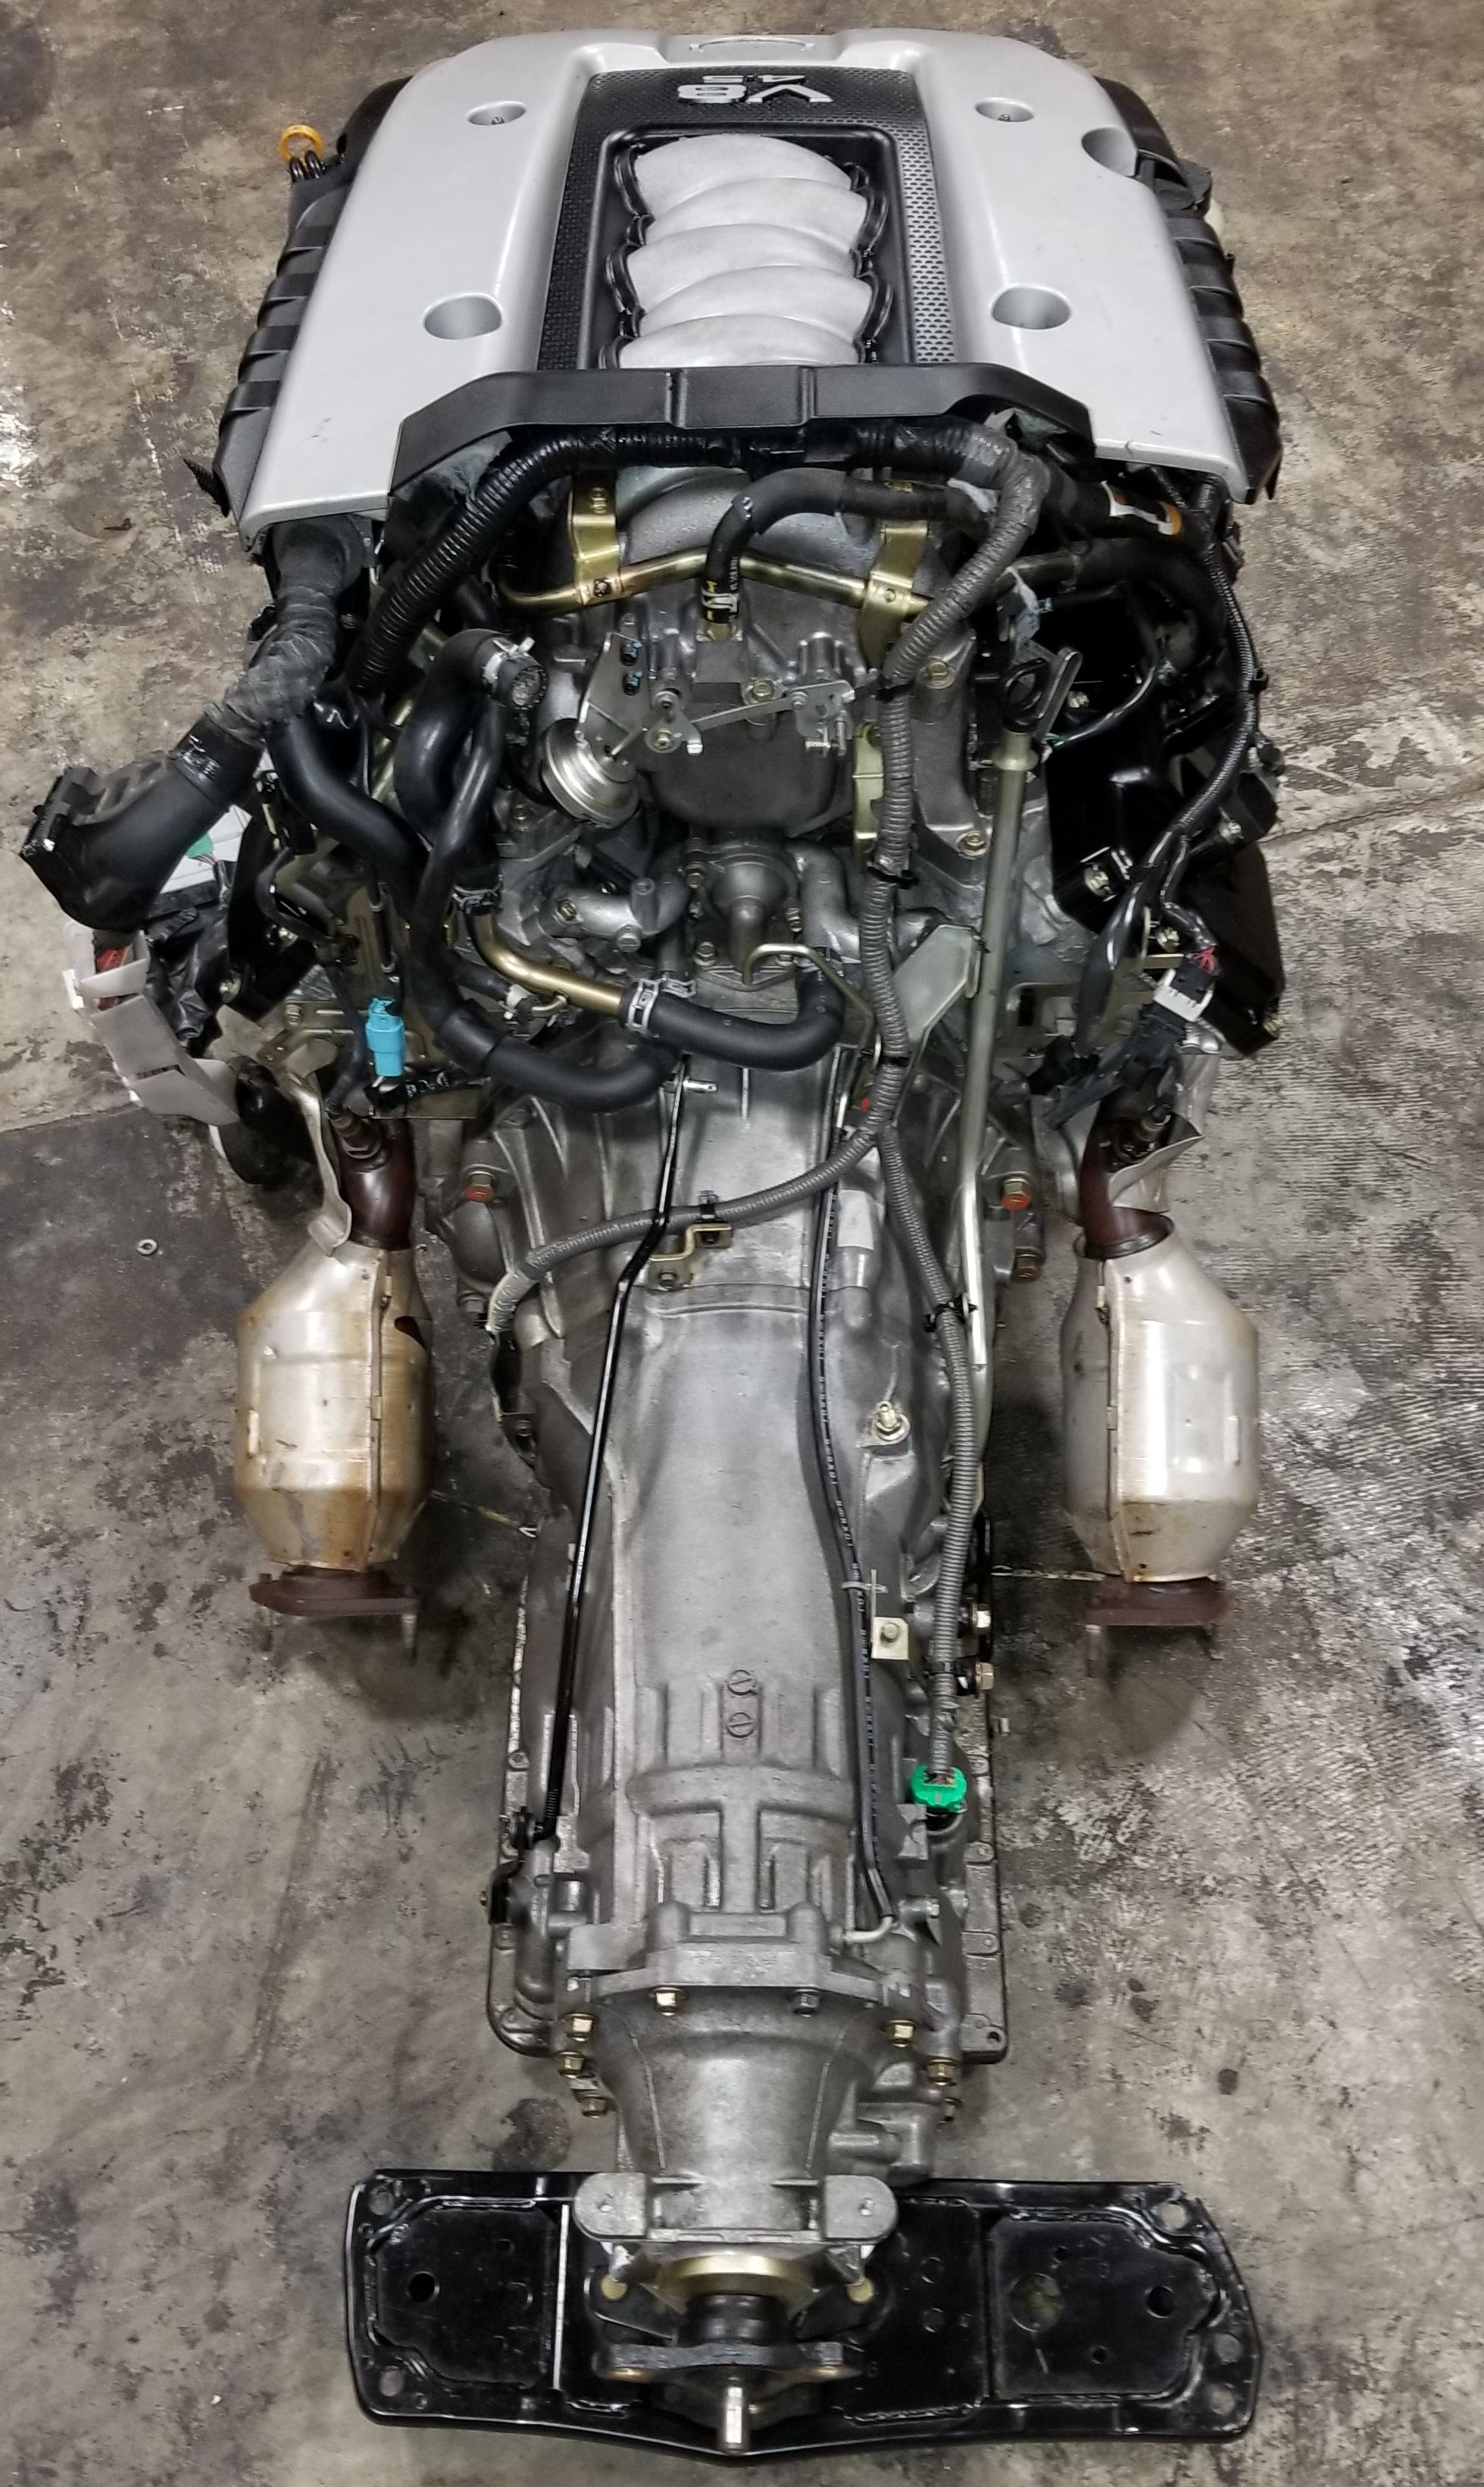 Nissan Chula Vista >> VK45DE INFINITY RWD Q45 M45 FX45 2002 2010 JDM COMPLETE ENGINE TRANSMISSION SWAP | JDM Of San Diego